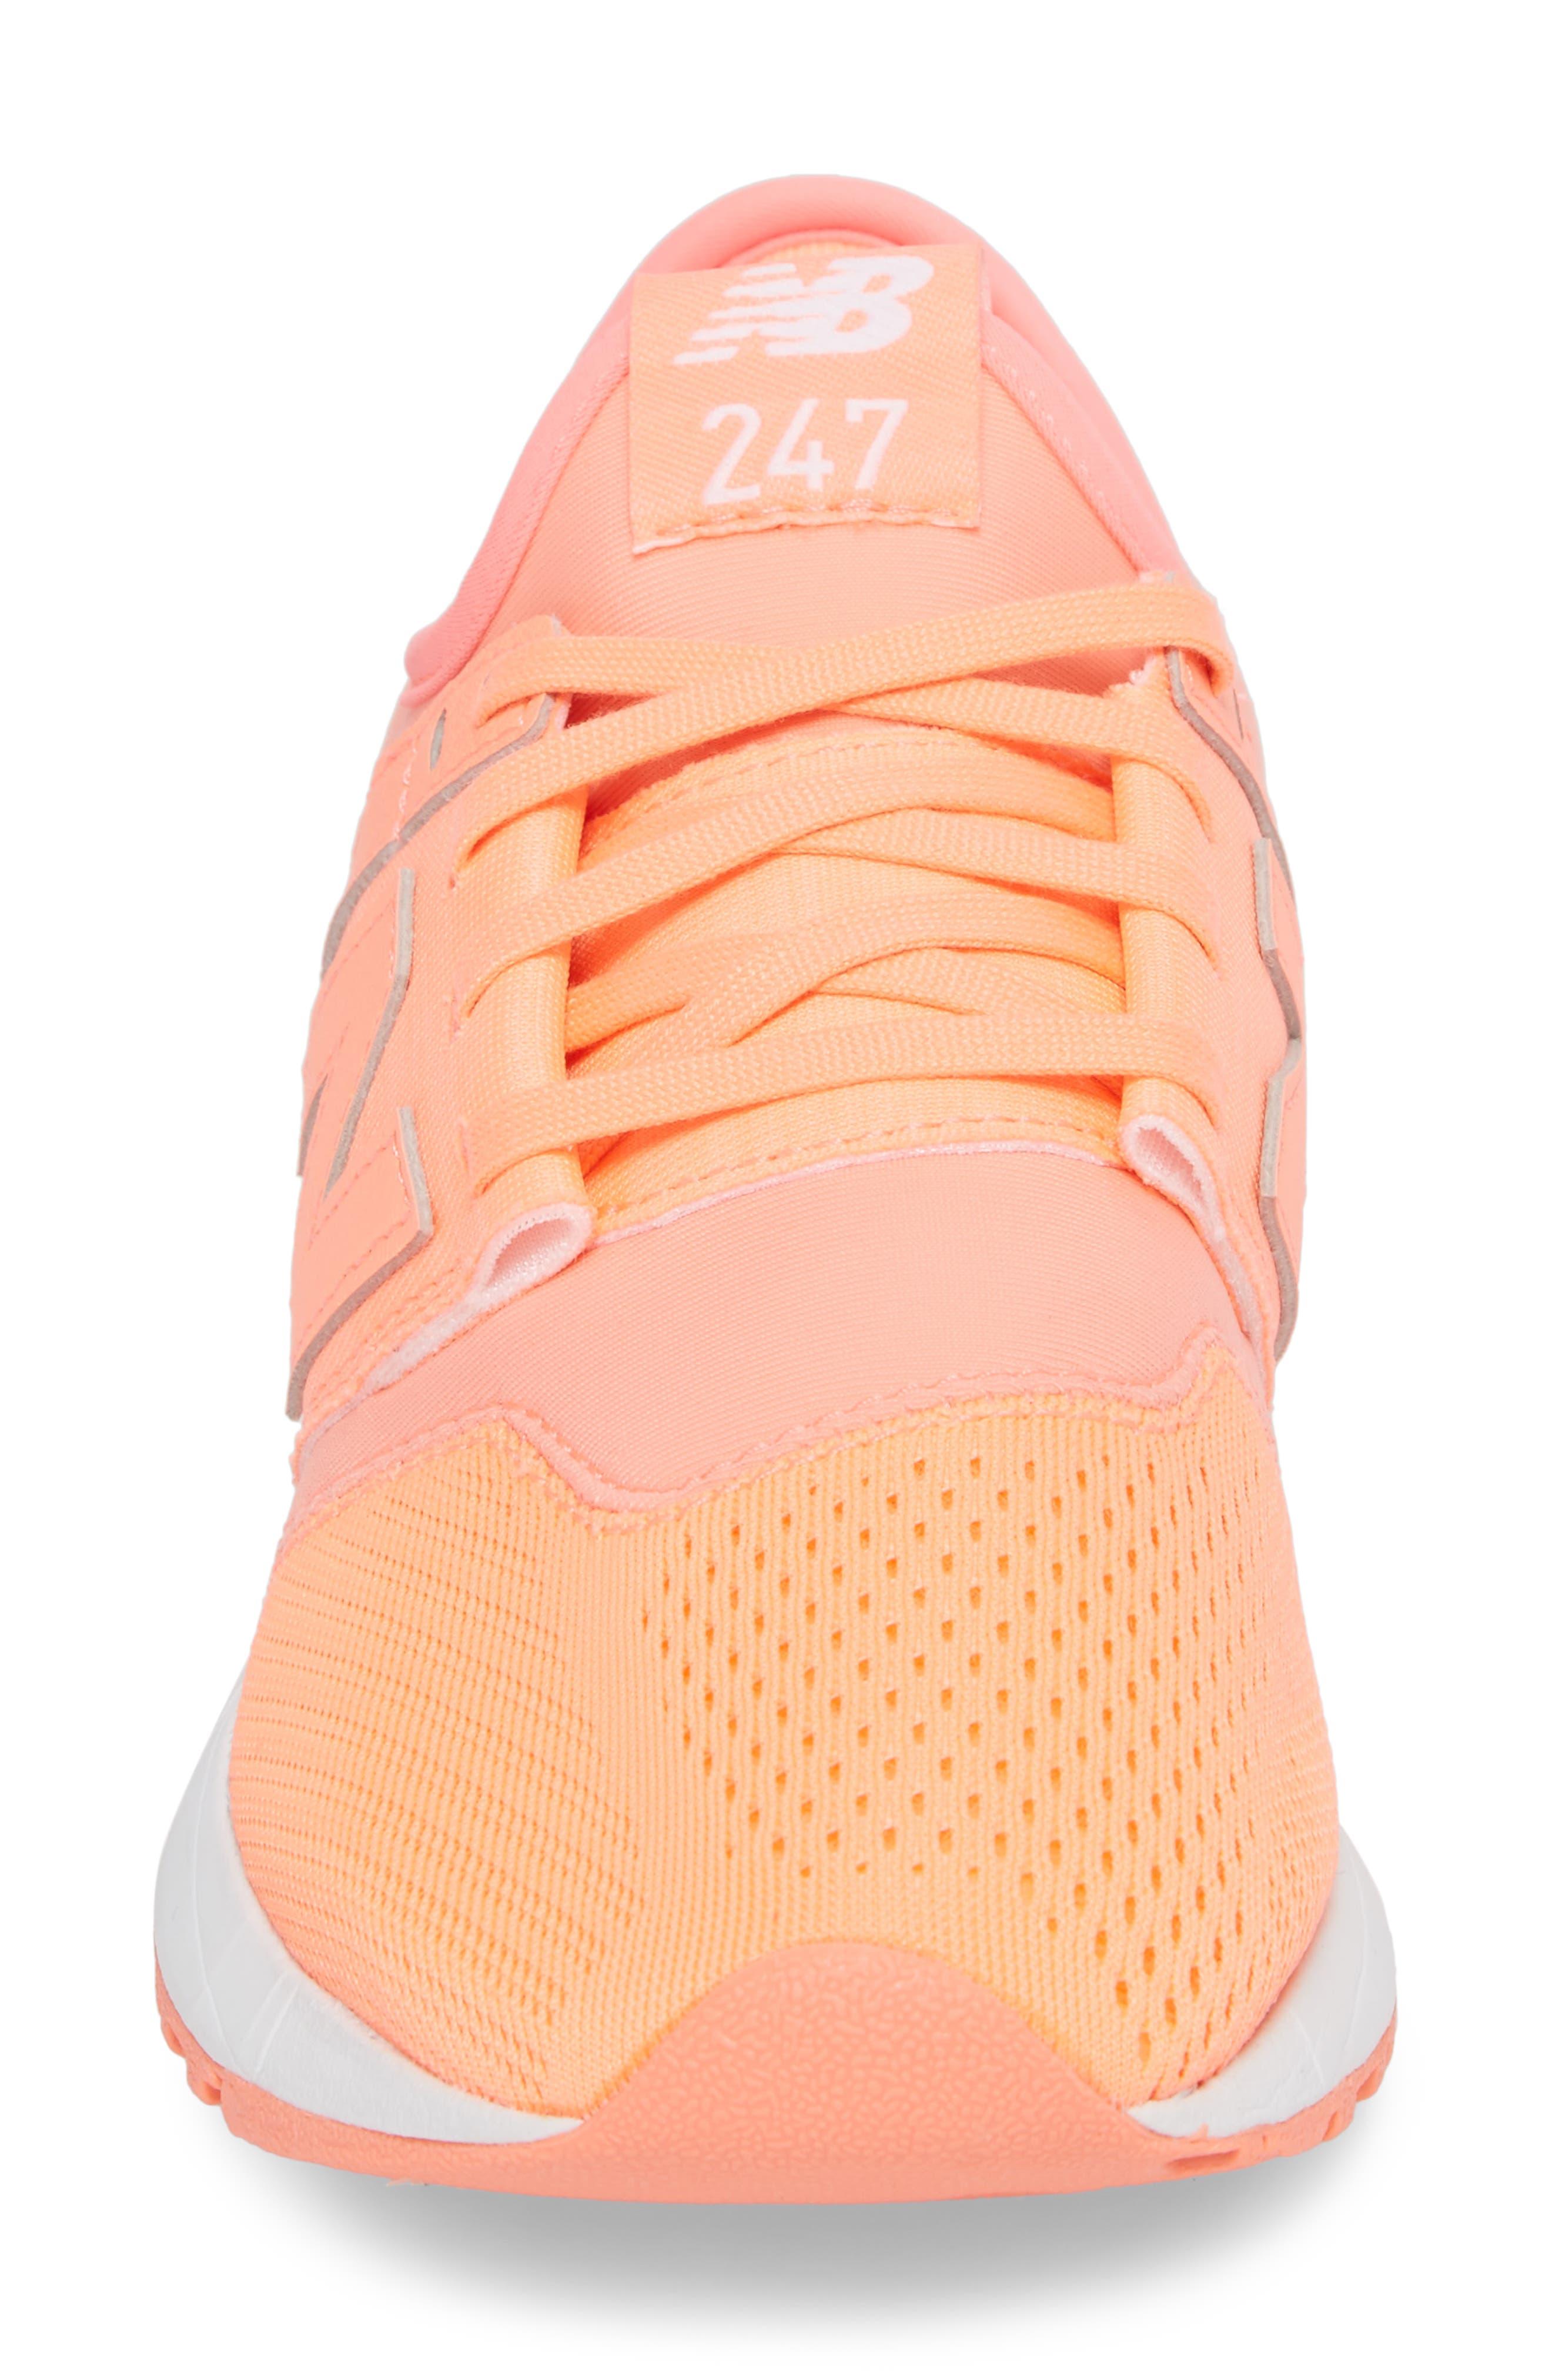 247 Classic Sneaker,                             Alternate thumbnail 8, color,